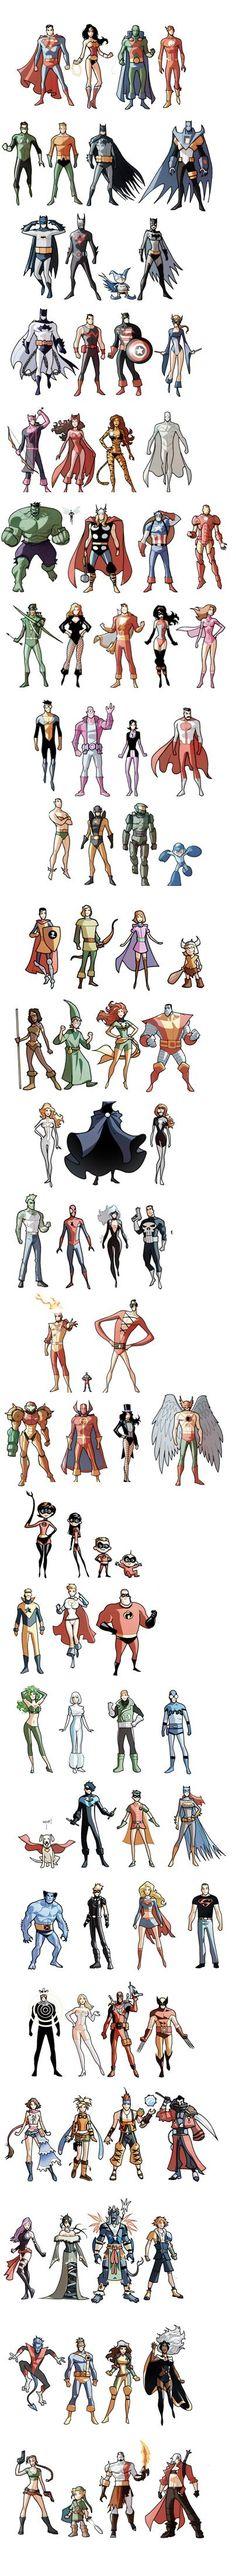 AWESOME!!! (but no She-Ra, He-Man, Tifa, Tera, Rinoa, Aerith, or Beatrix? SMH) By Marcio Takara